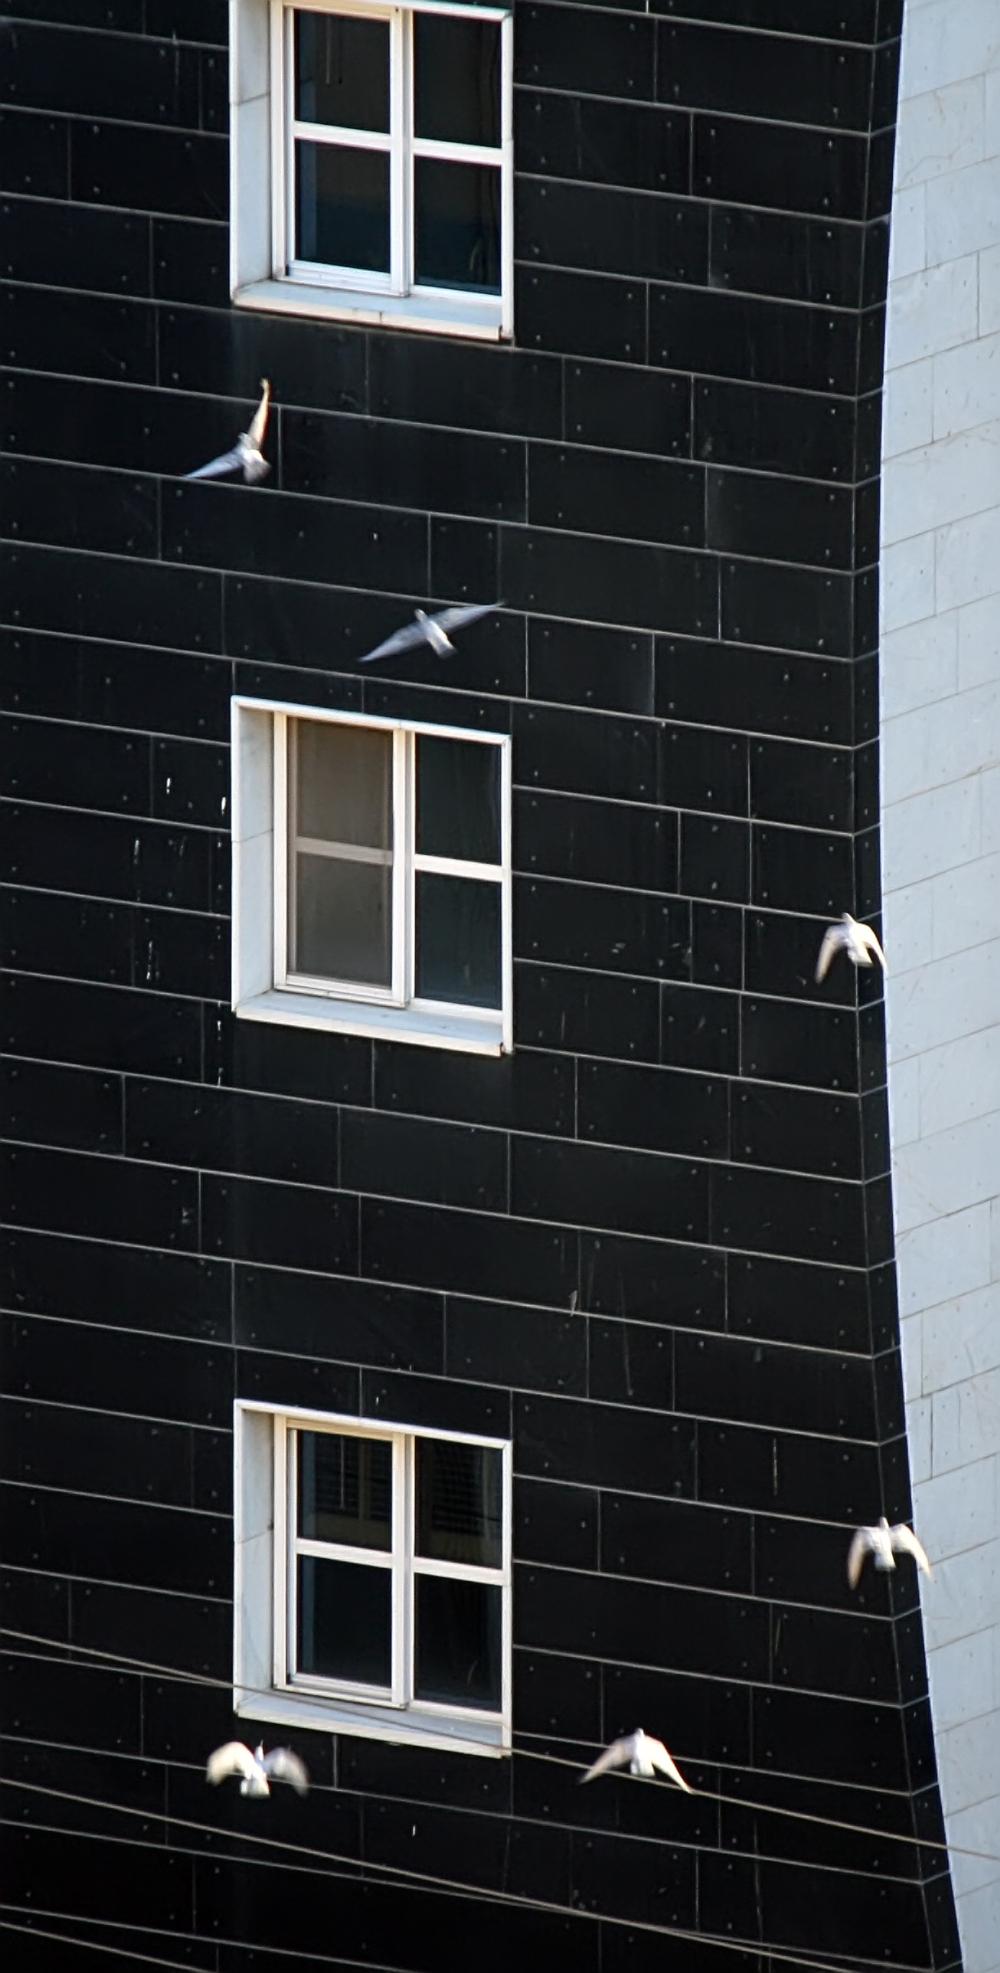 Mass movement of pigeons